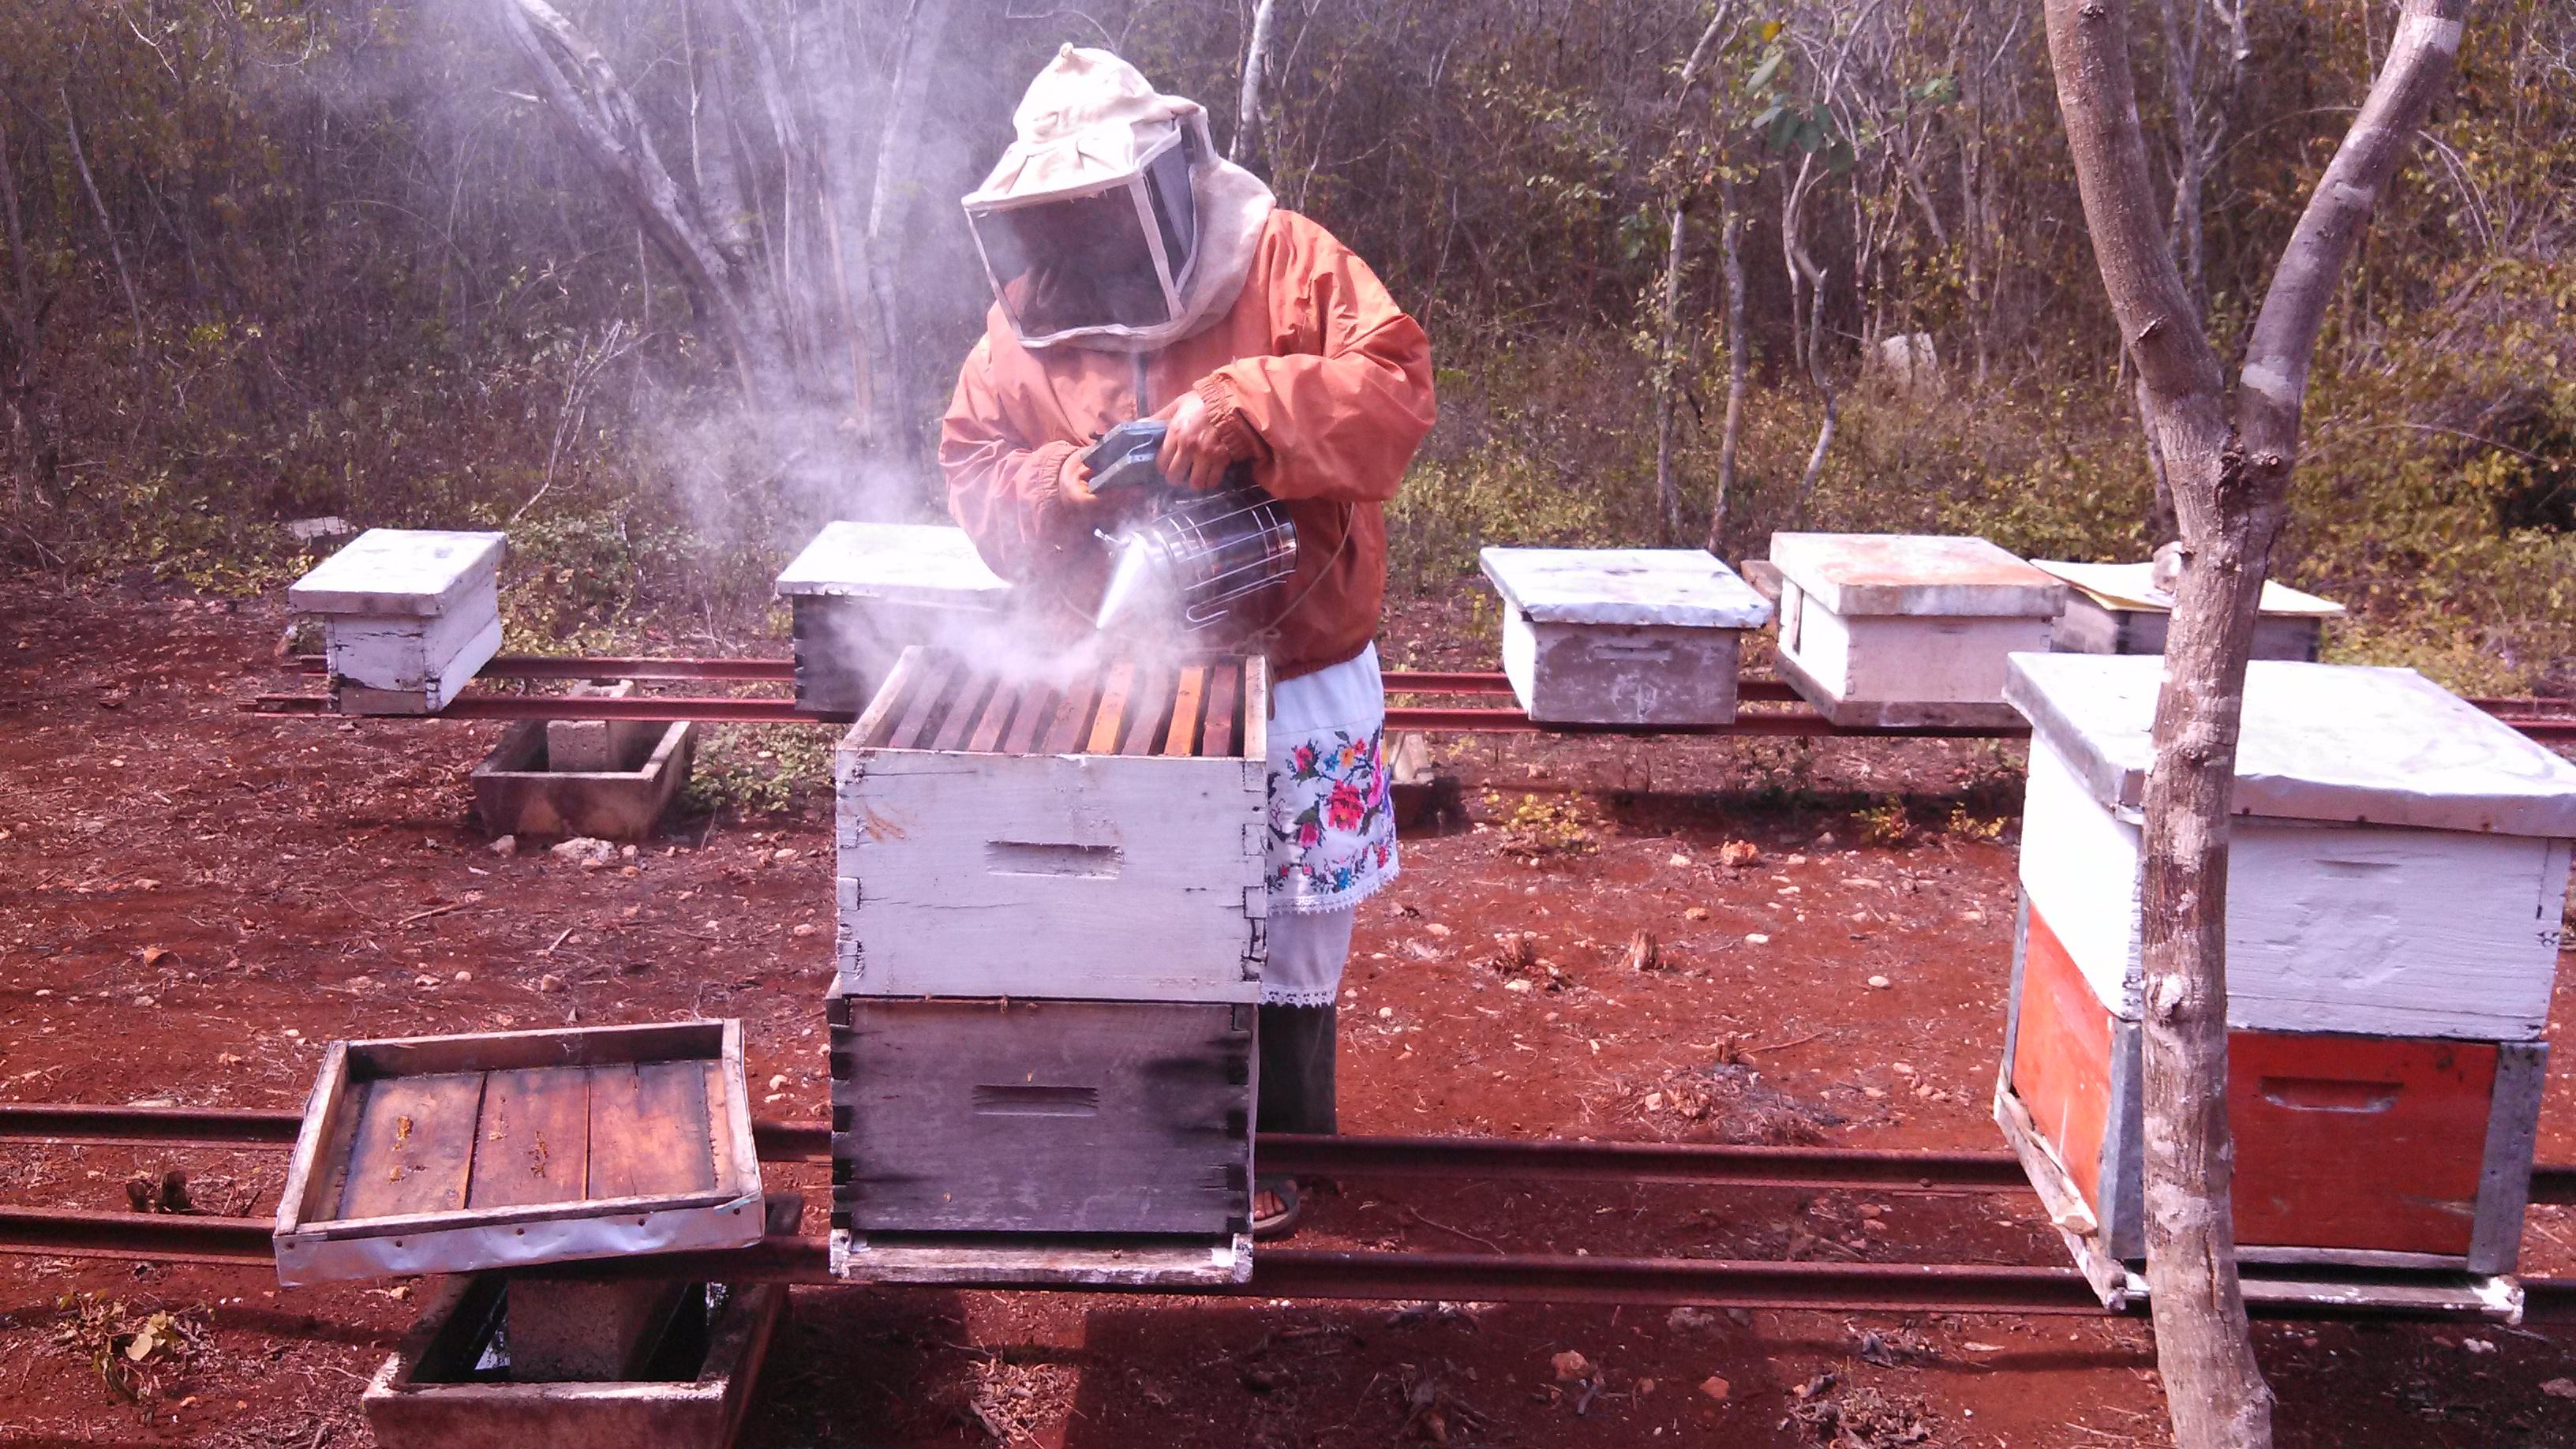 Cosecha de miel mexicana alcanzó casi 51 mil toneladas en 2017